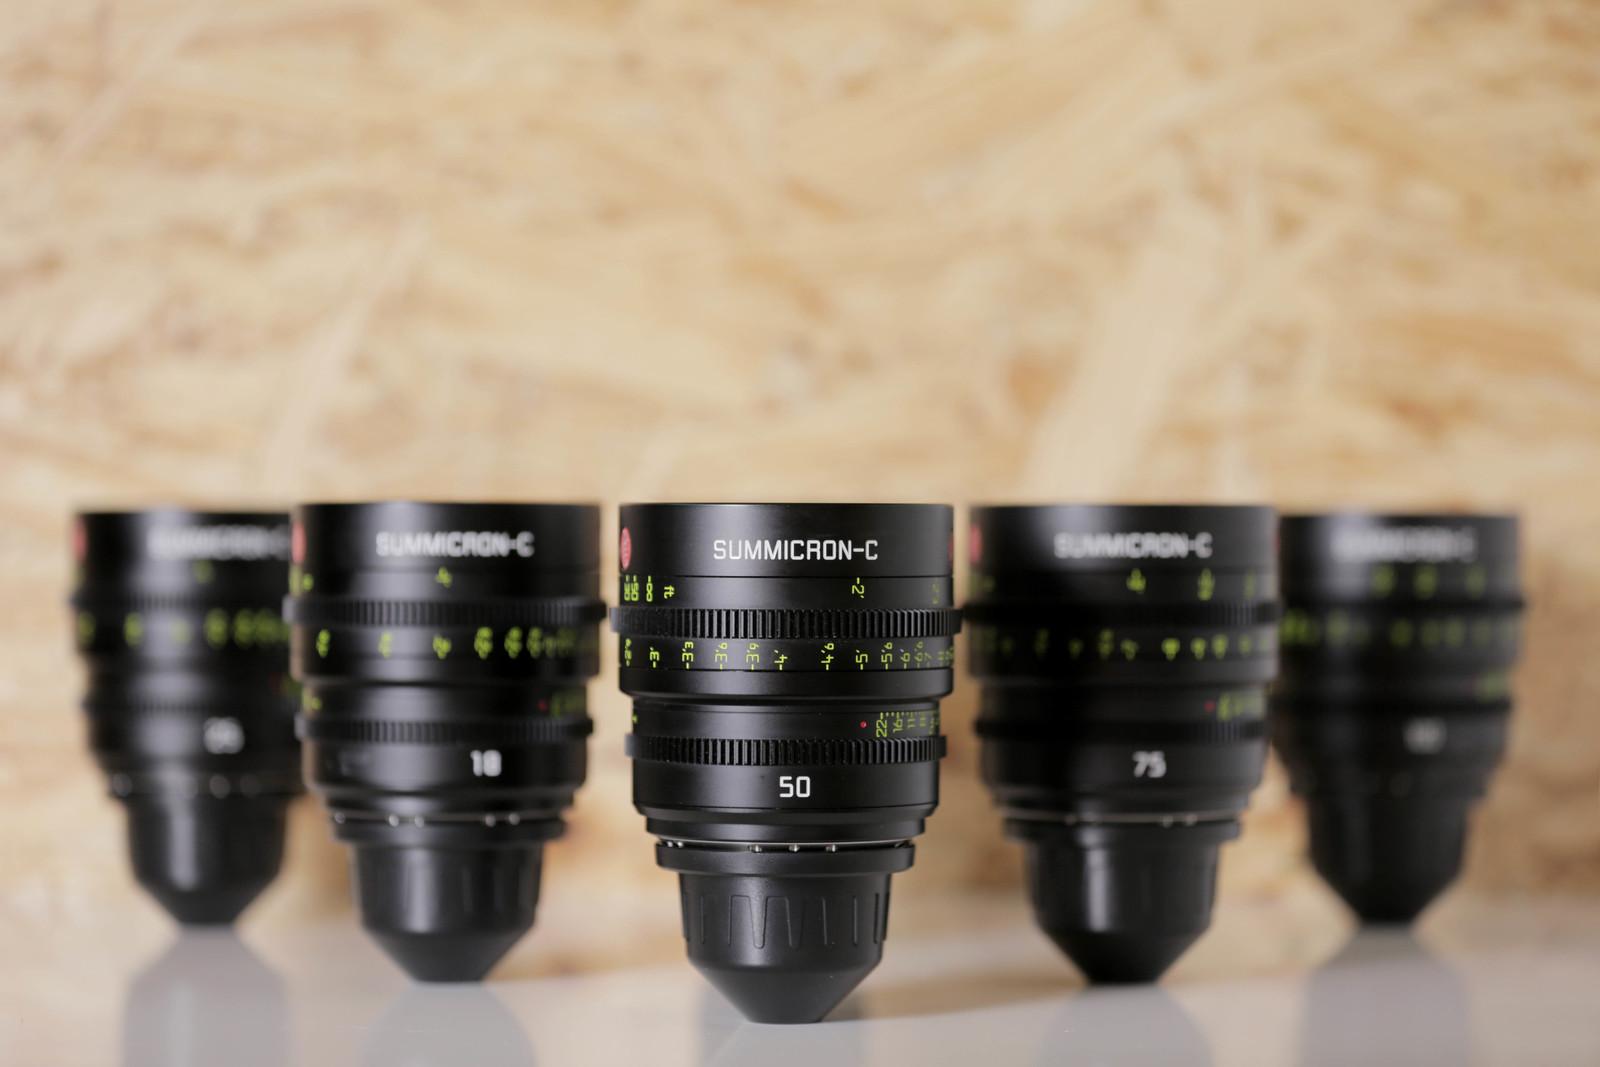 Rent a Leica Summicron-C T2 0 Lens Set, Best Prices | ShareGrid Los Angeles